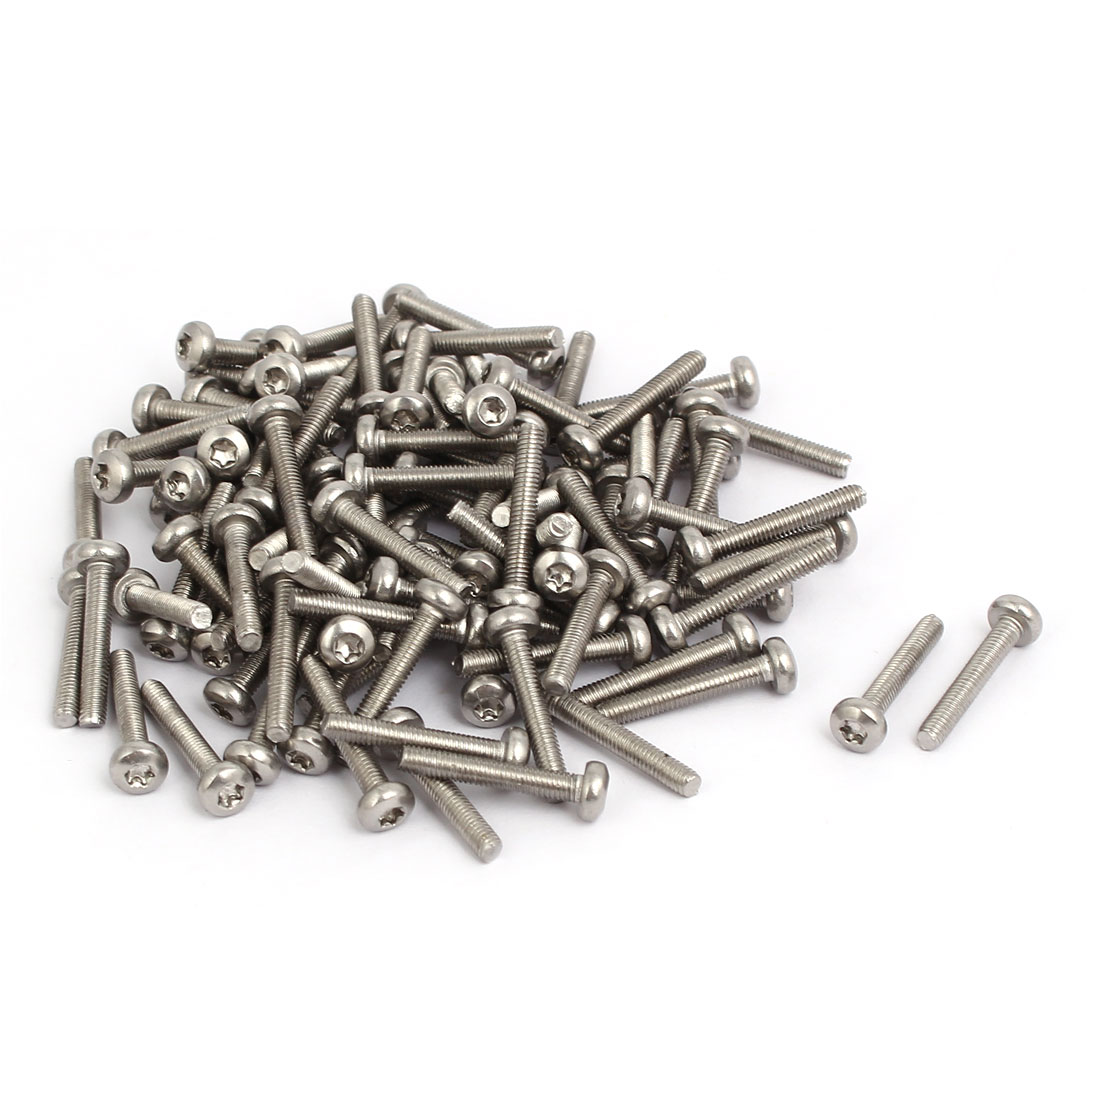 M3x18mm 304 Stainless Steel Button Head Torx Screws Fasteners 100pcs